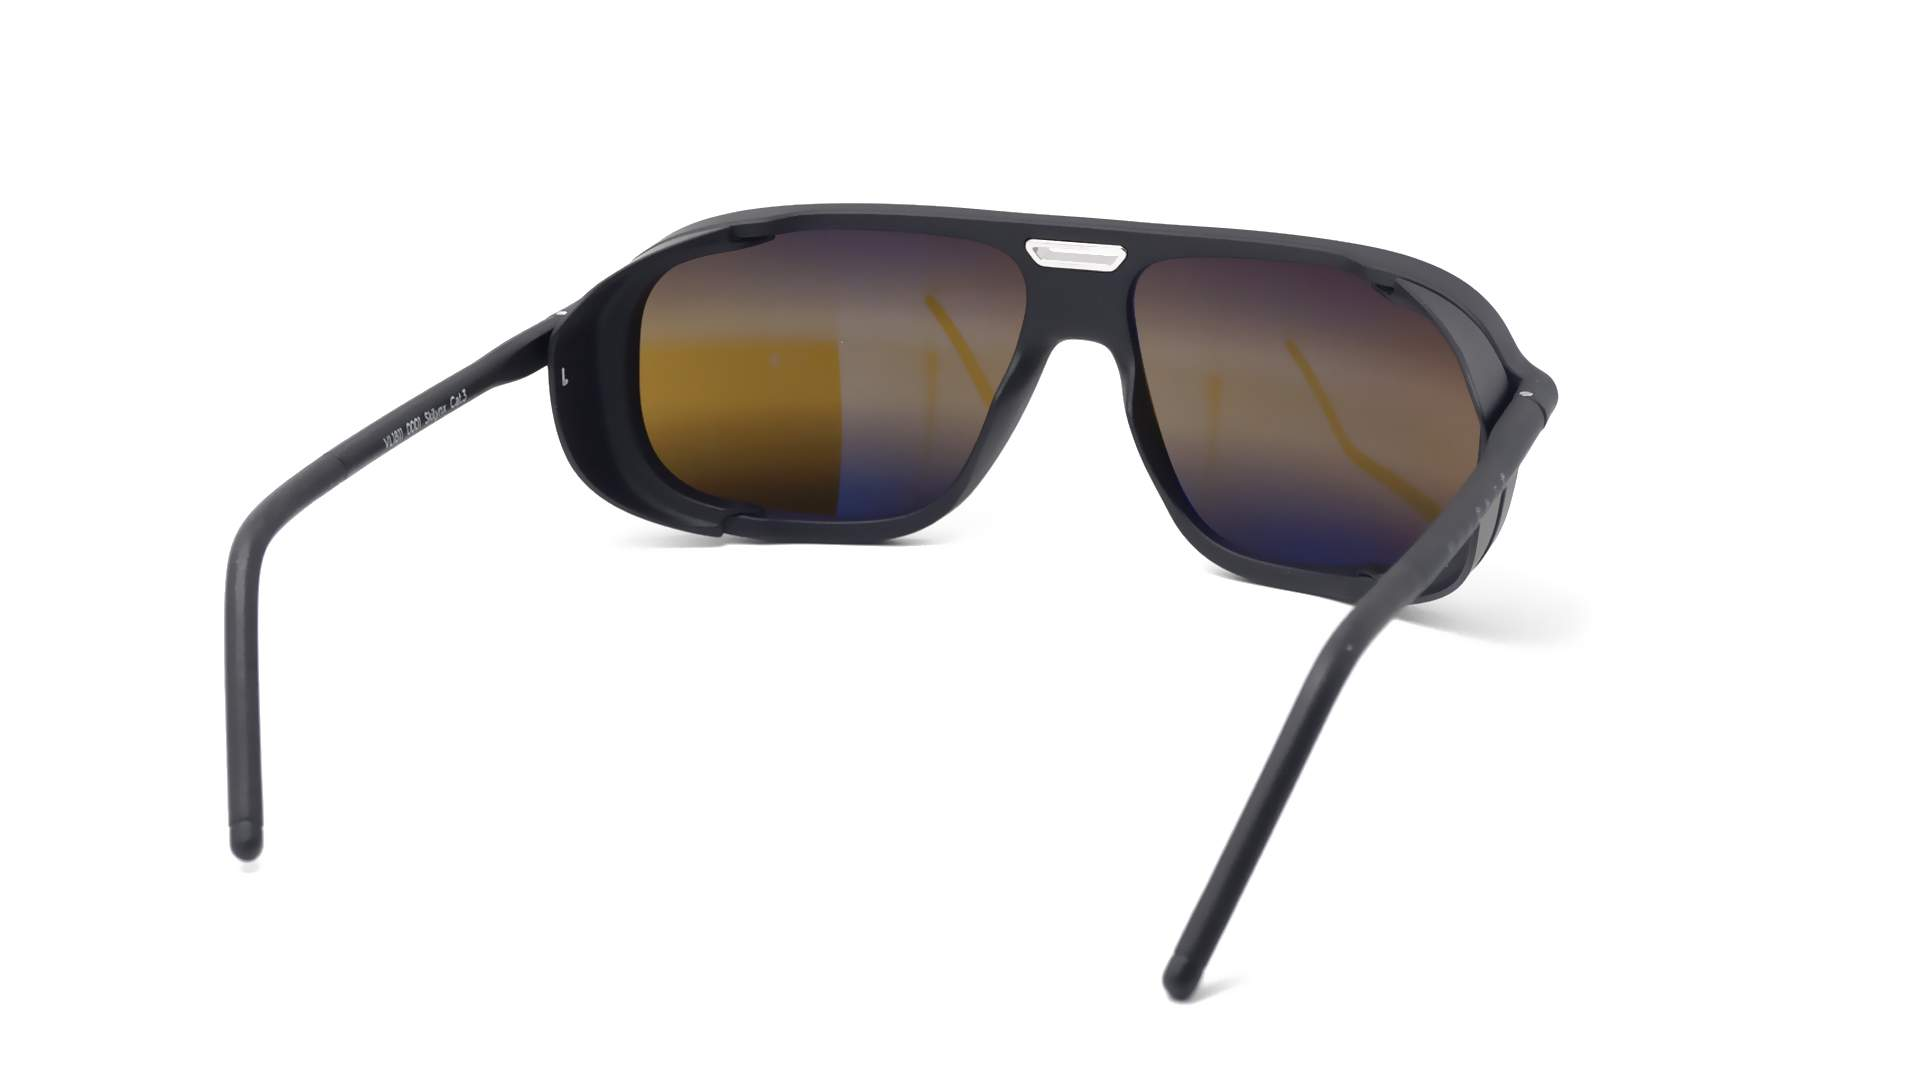 eca5e14892 Sunglasses Vuarnet Ice Black Matte Skilynx VL1811 0001 60-15 Large Gradient  Mirror